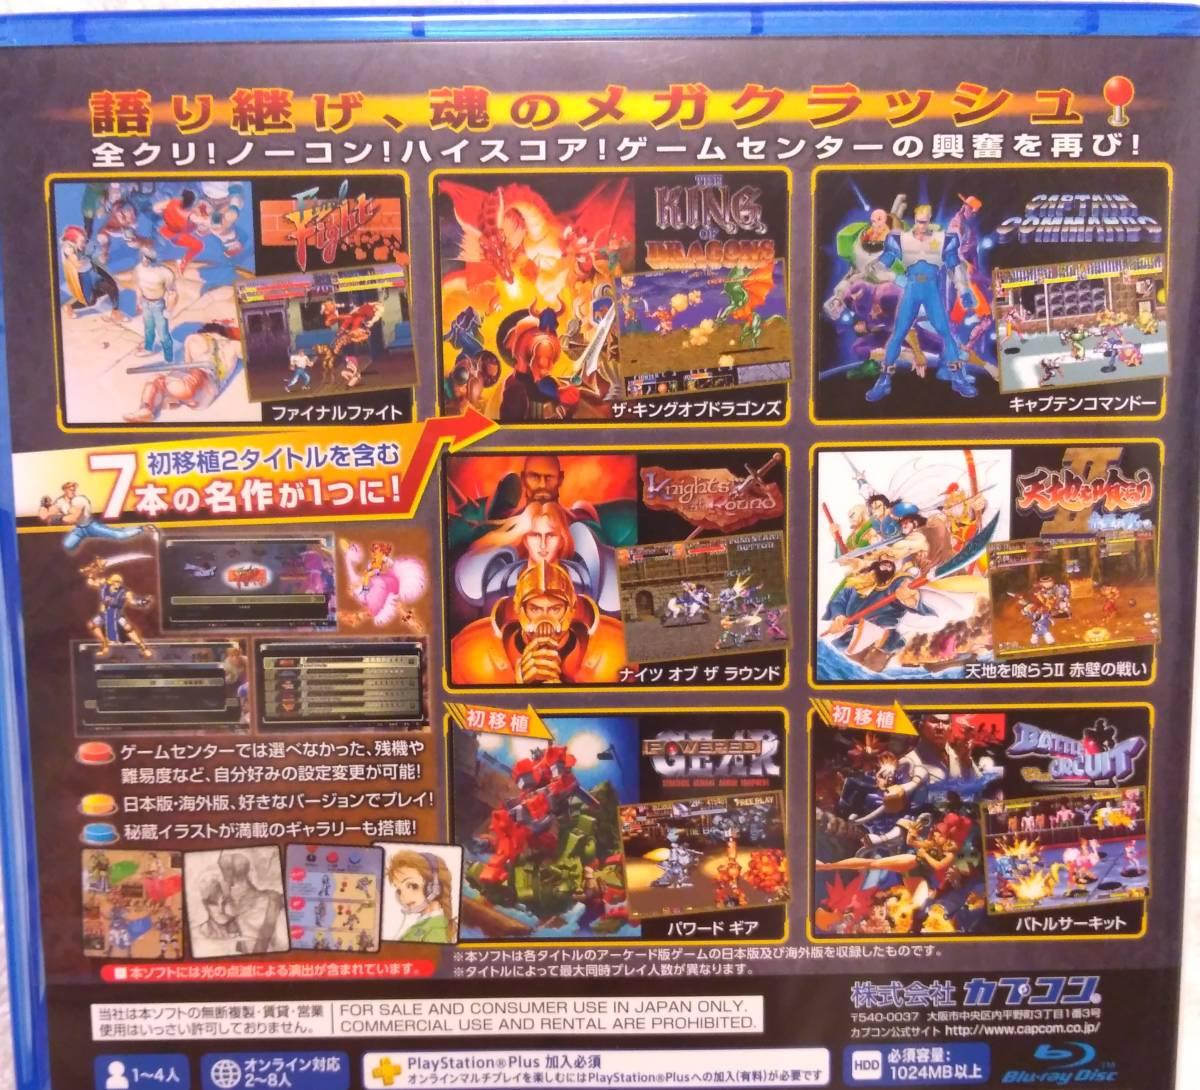 PS4 カプコン ベルトアクション コレクション 【ファイナルファイト 天地を喰らうⅡ】